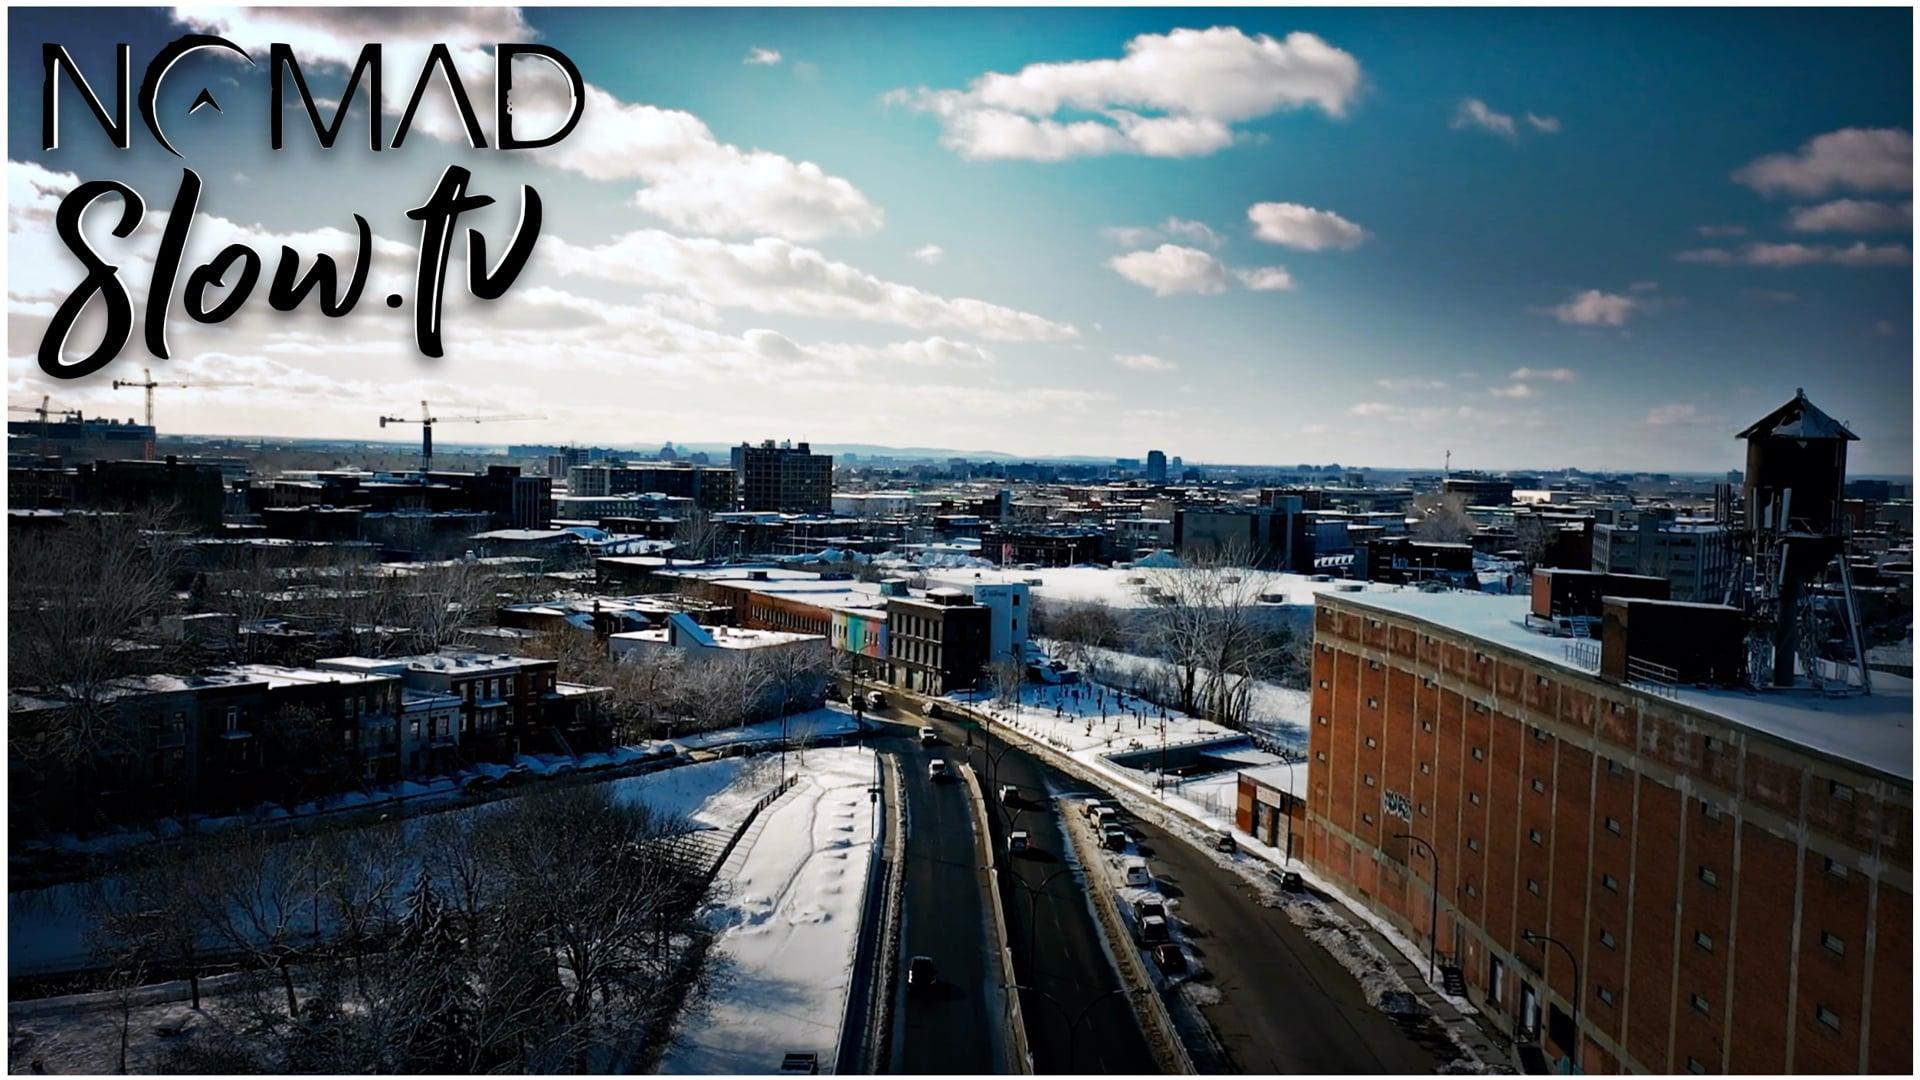 NOMAD Nation - Slow Winter - drone shot